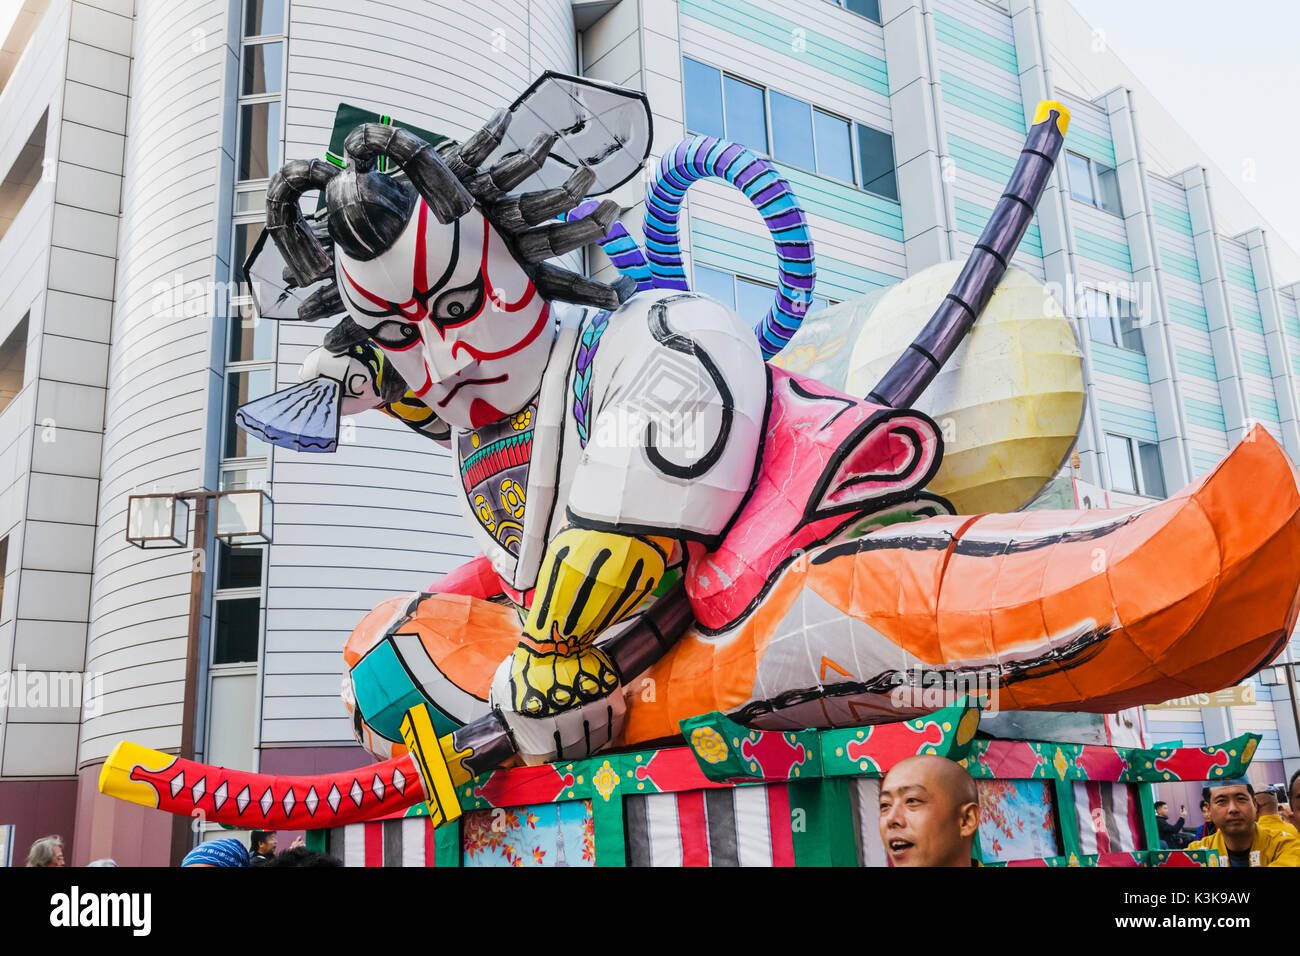 Japan, Hoshu, Tokyo, Asakusa, Nebuta Festival, Float with Giant Kabuki Actor - Stock Image